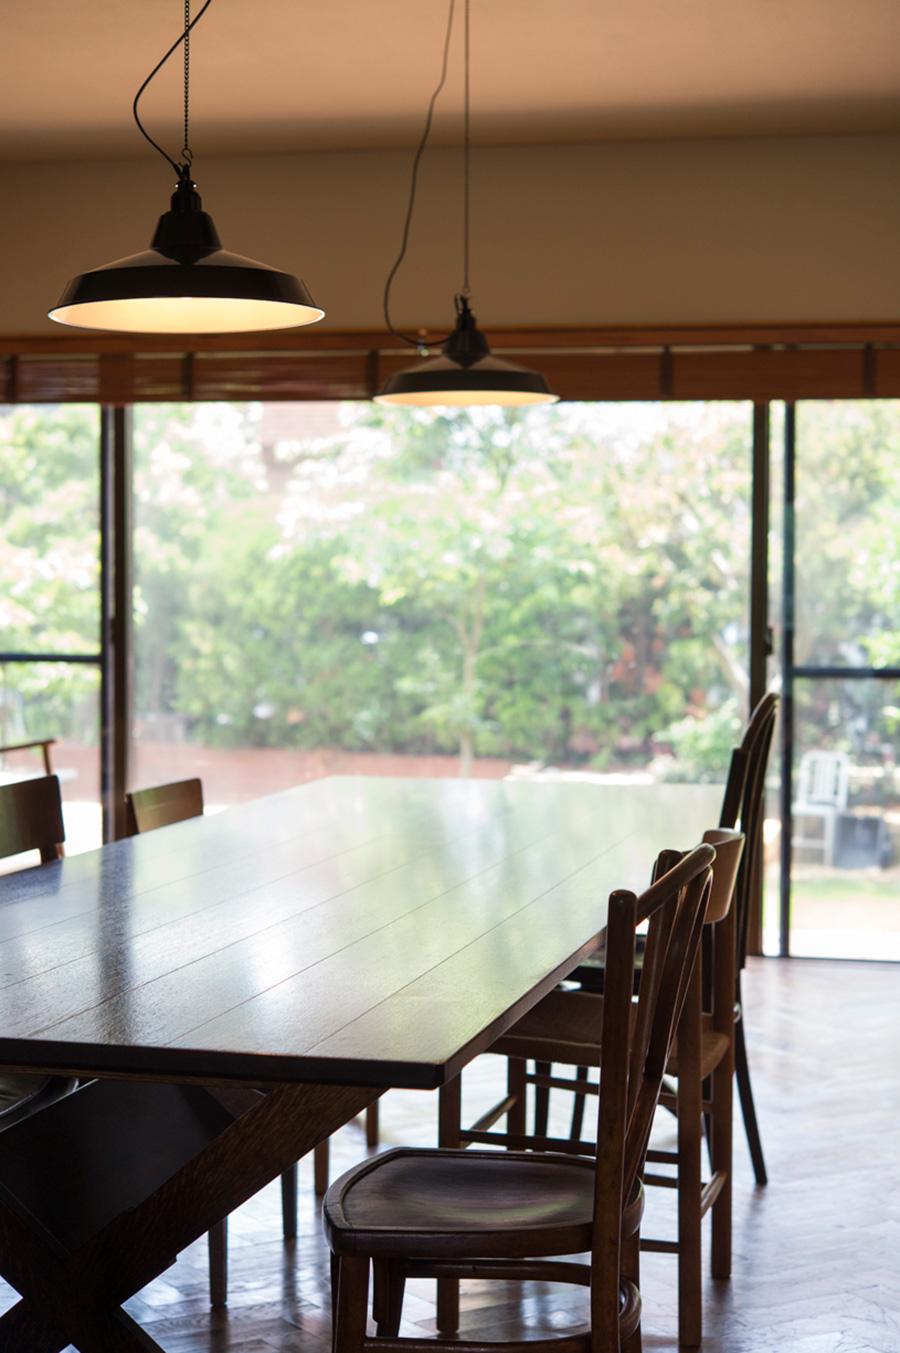 3mあるダイニングテーブルは、「スタンダード トレード」オリジナル。庭の緑を眺めながら食卓を囲む。